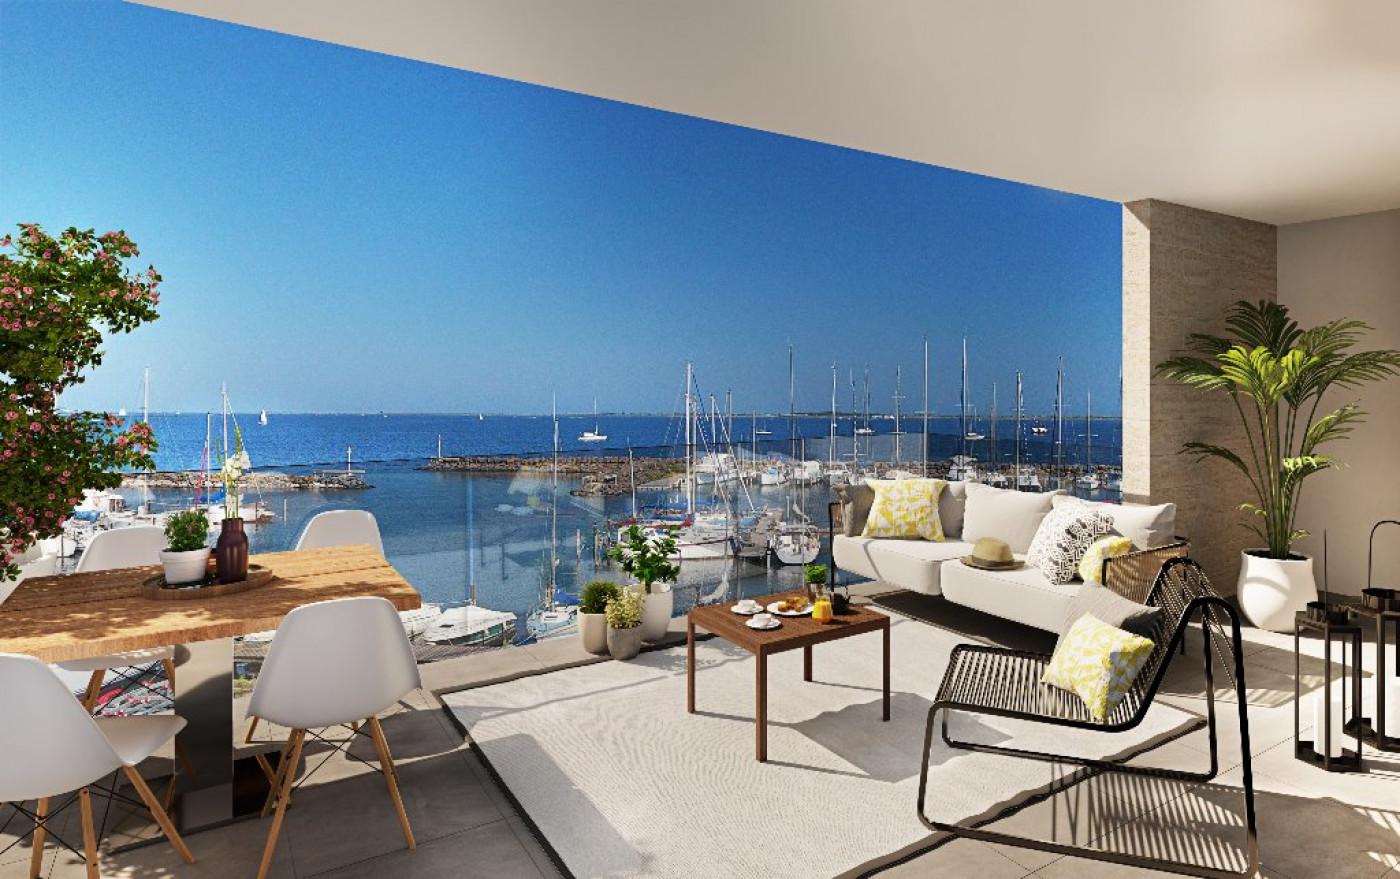 A vendre  Marseillan | Réf 343756131 - Castell immobilier